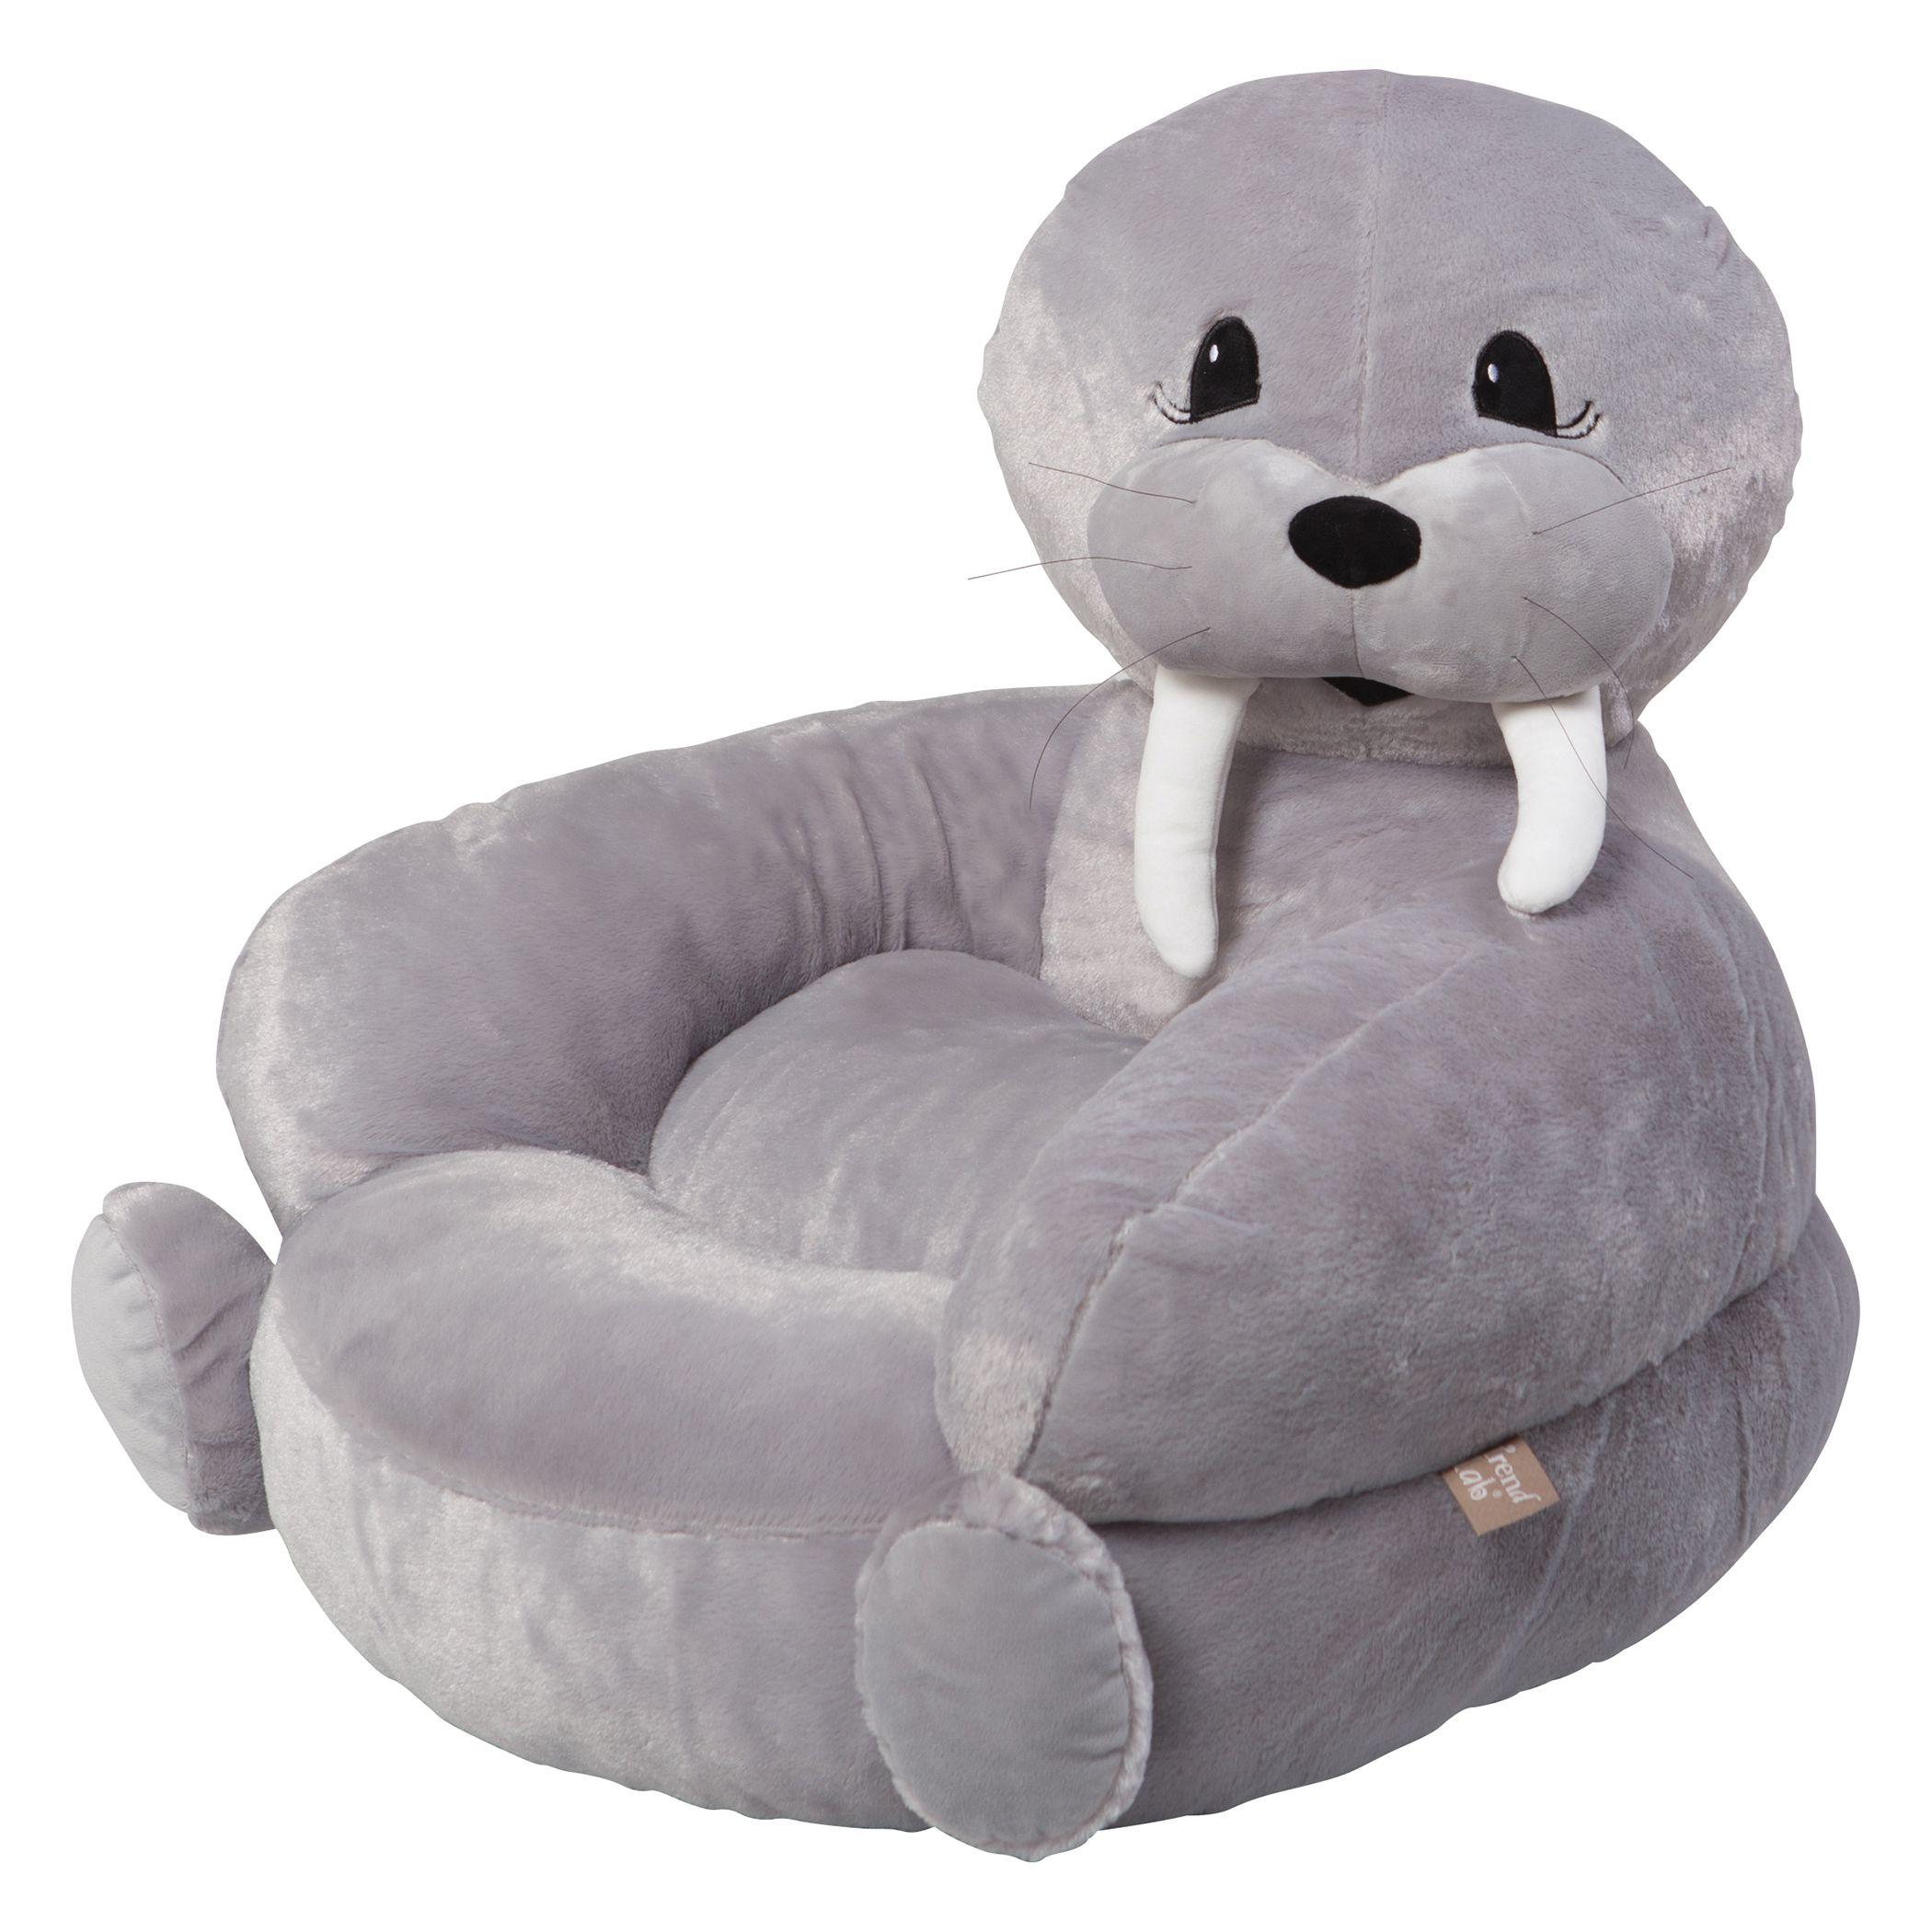 Plush · The Childrenu0027s Plush Walrus Character Chair ...